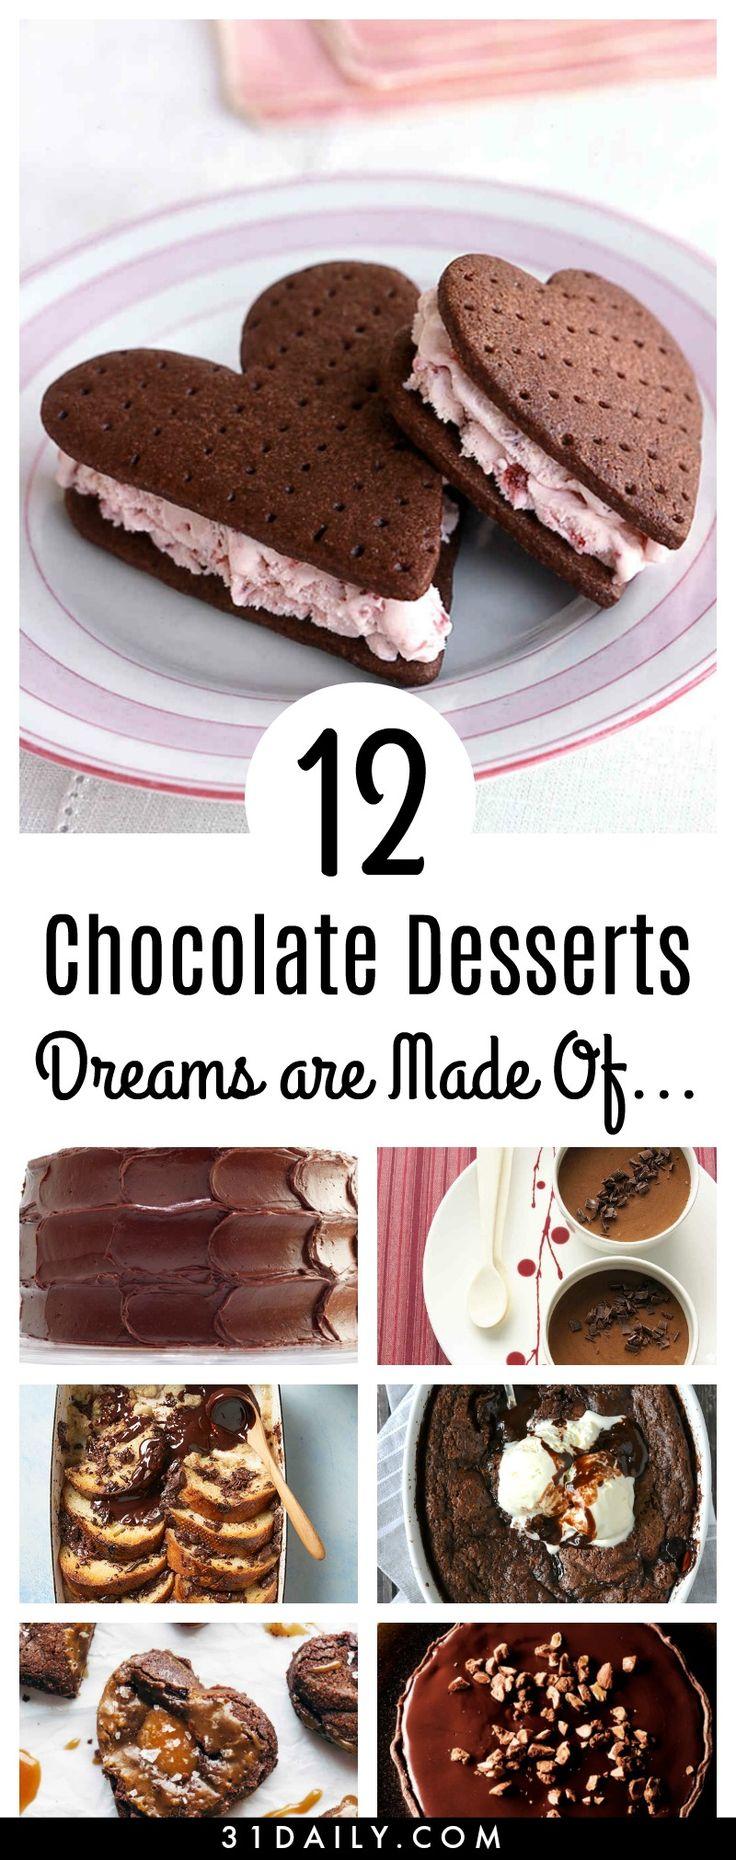 26916 best Favorite Recipes images on Pinterest